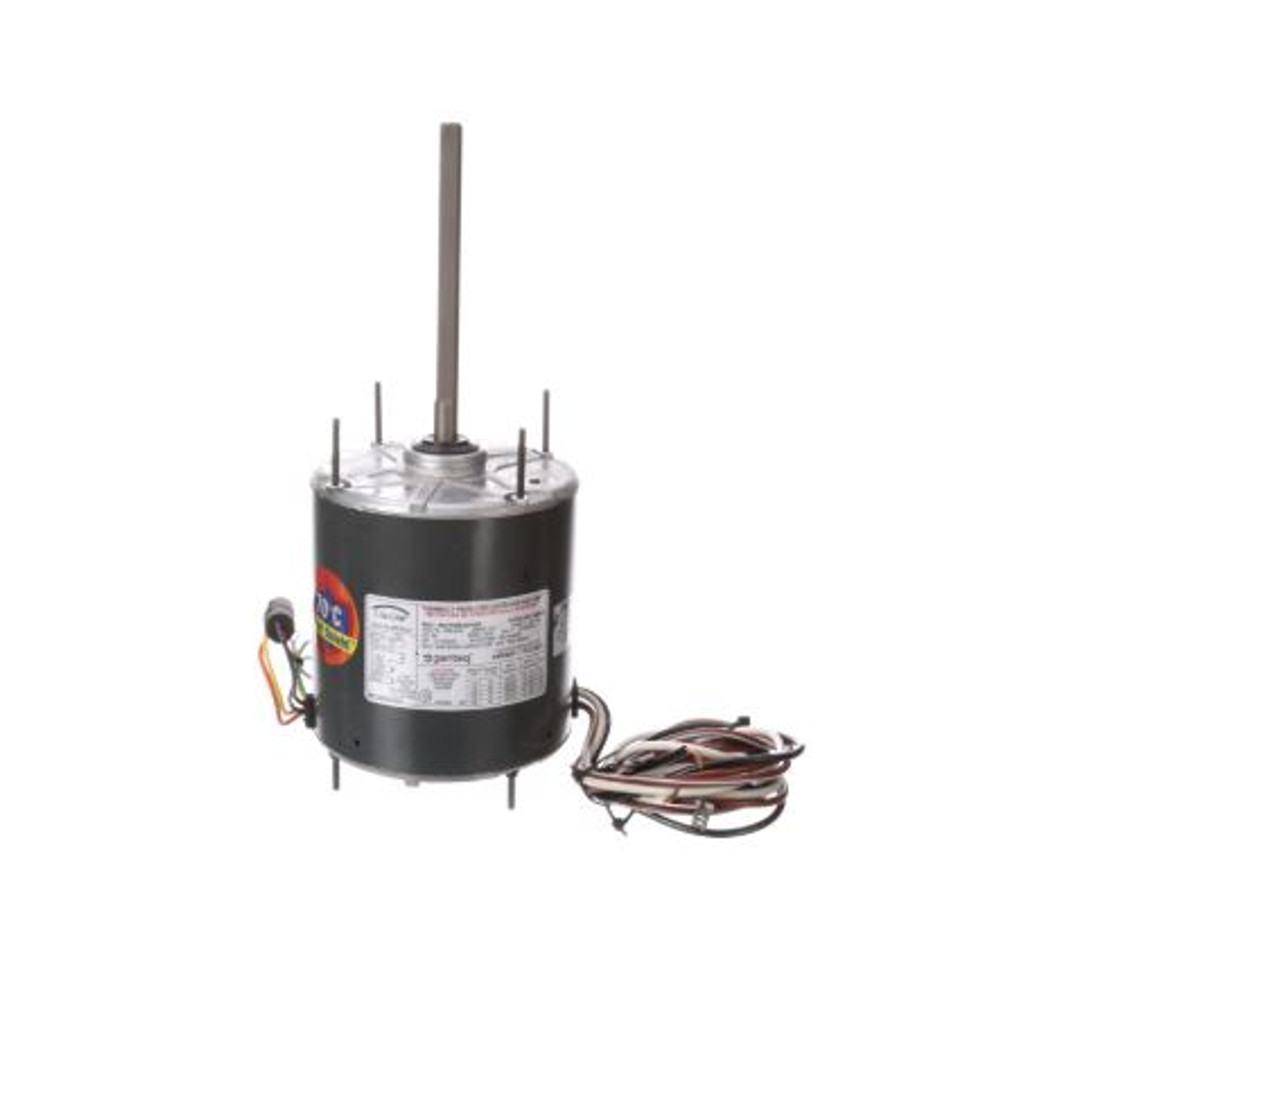 3460HS 5-5/8 In. Diameter Condenser Fan Motor 1/2-1/6 HP